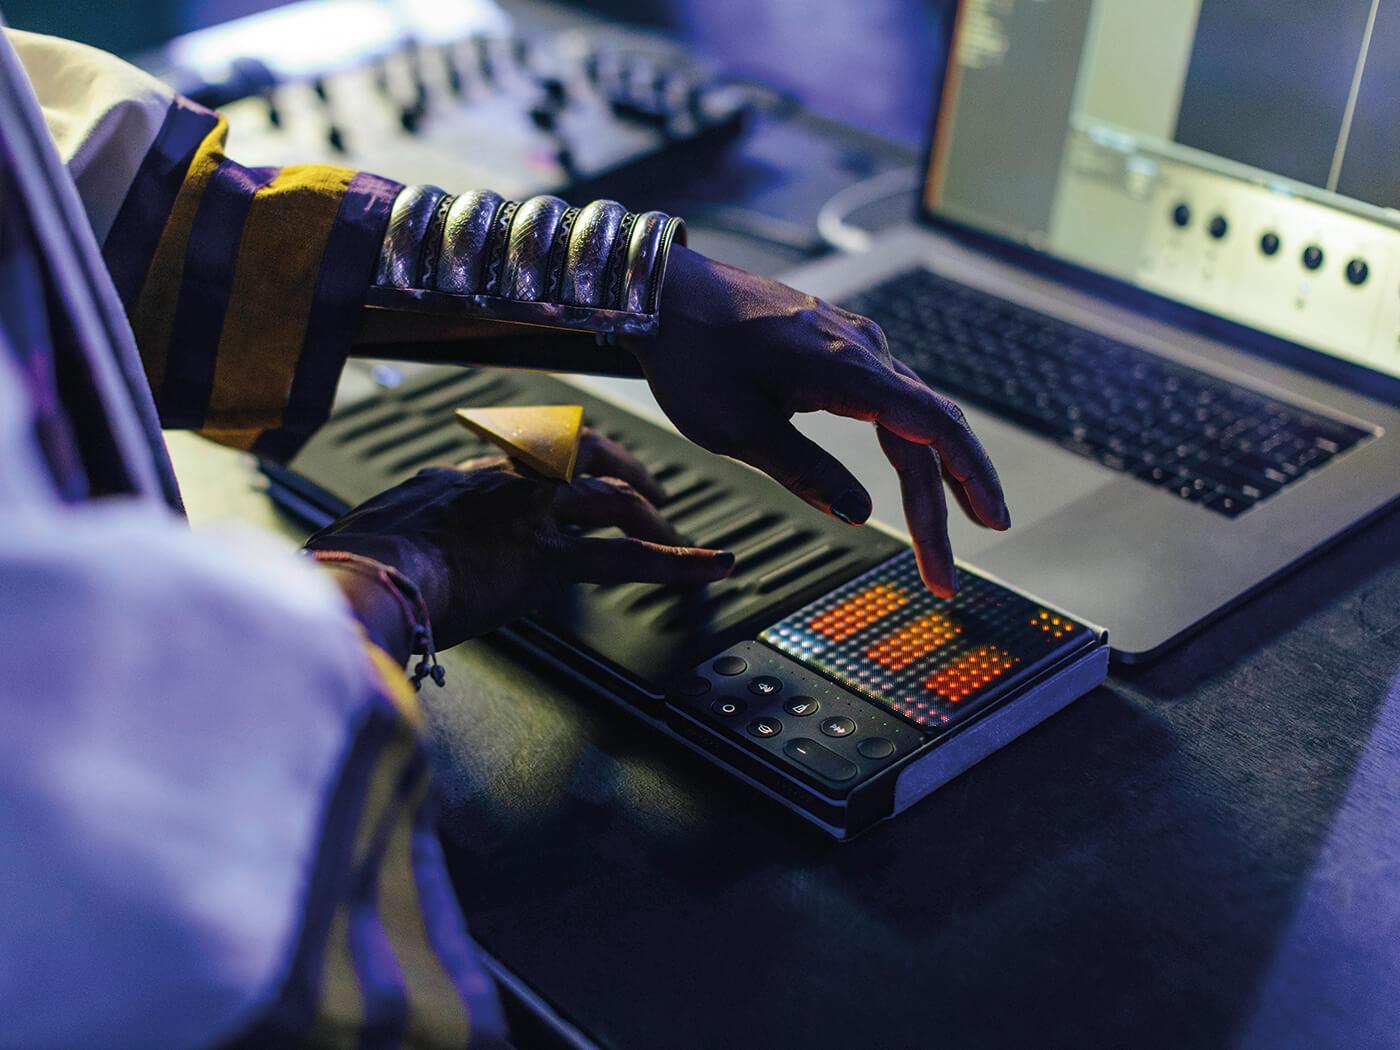 ROLI Blocks Songmaker/Beatmaker Kits